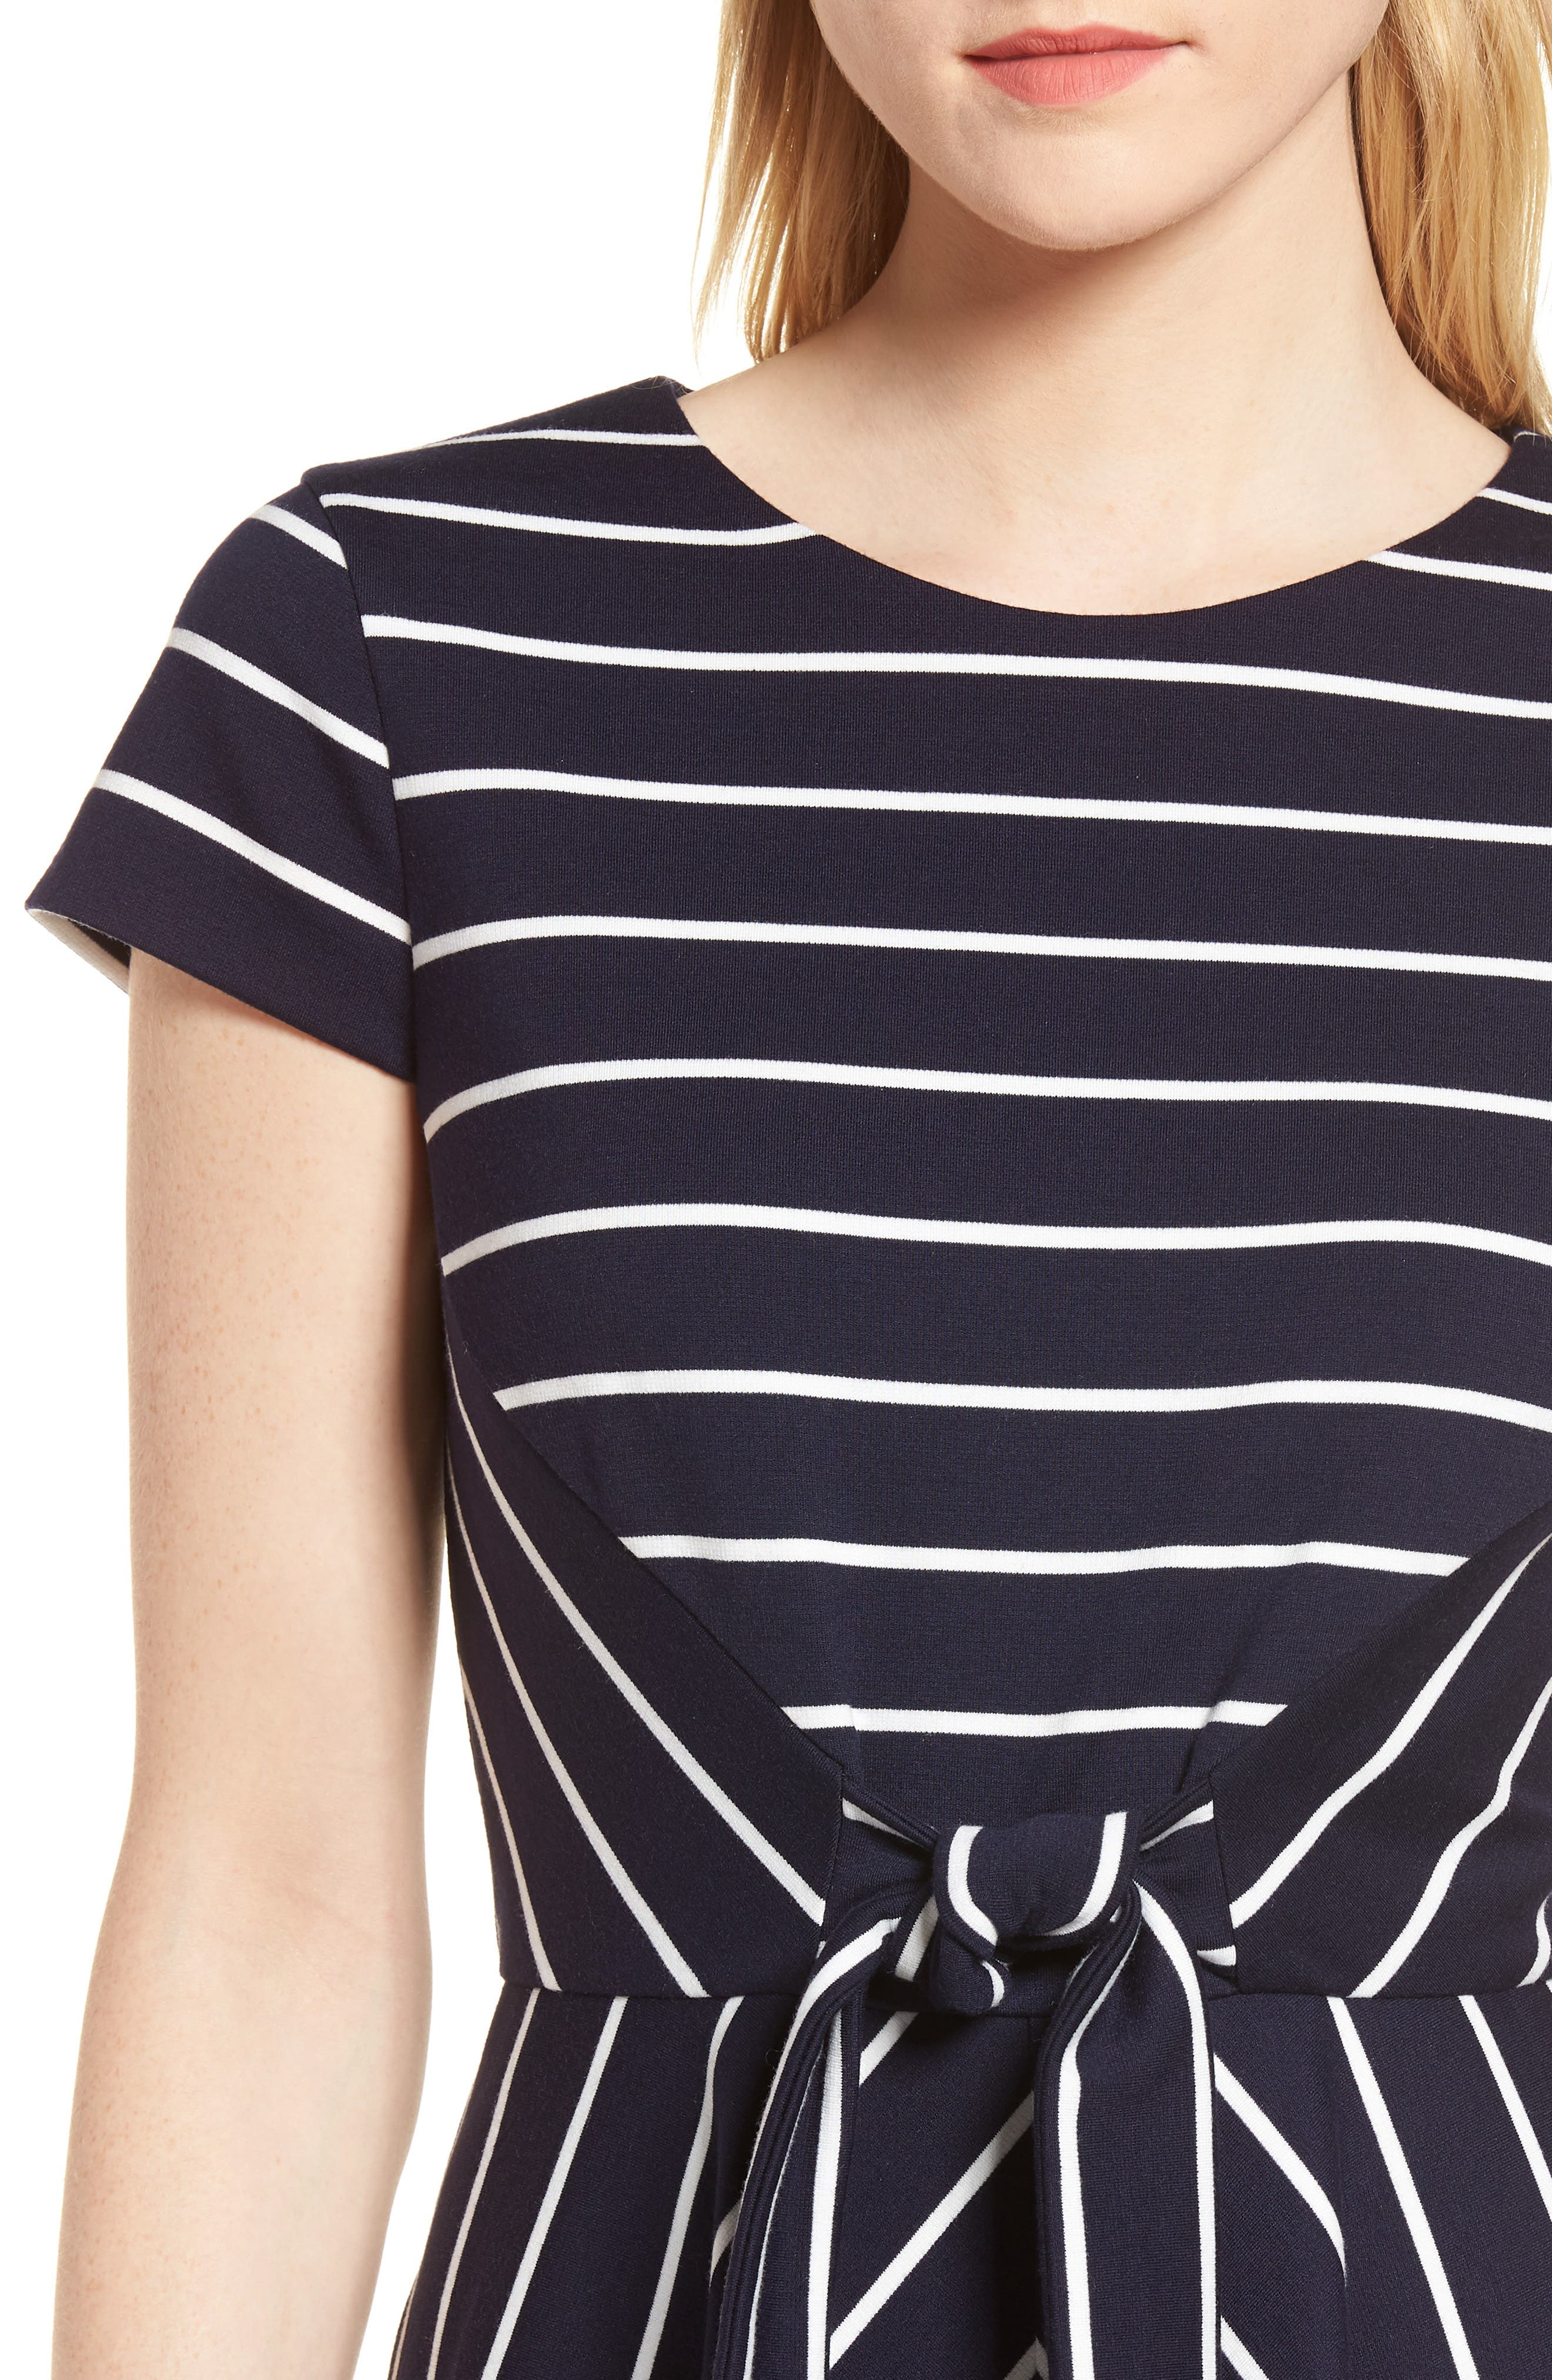 Stripe Ponte Fit & Flare Dress,                             Alternate thumbnail 4, color,                             Navy- White Stripe